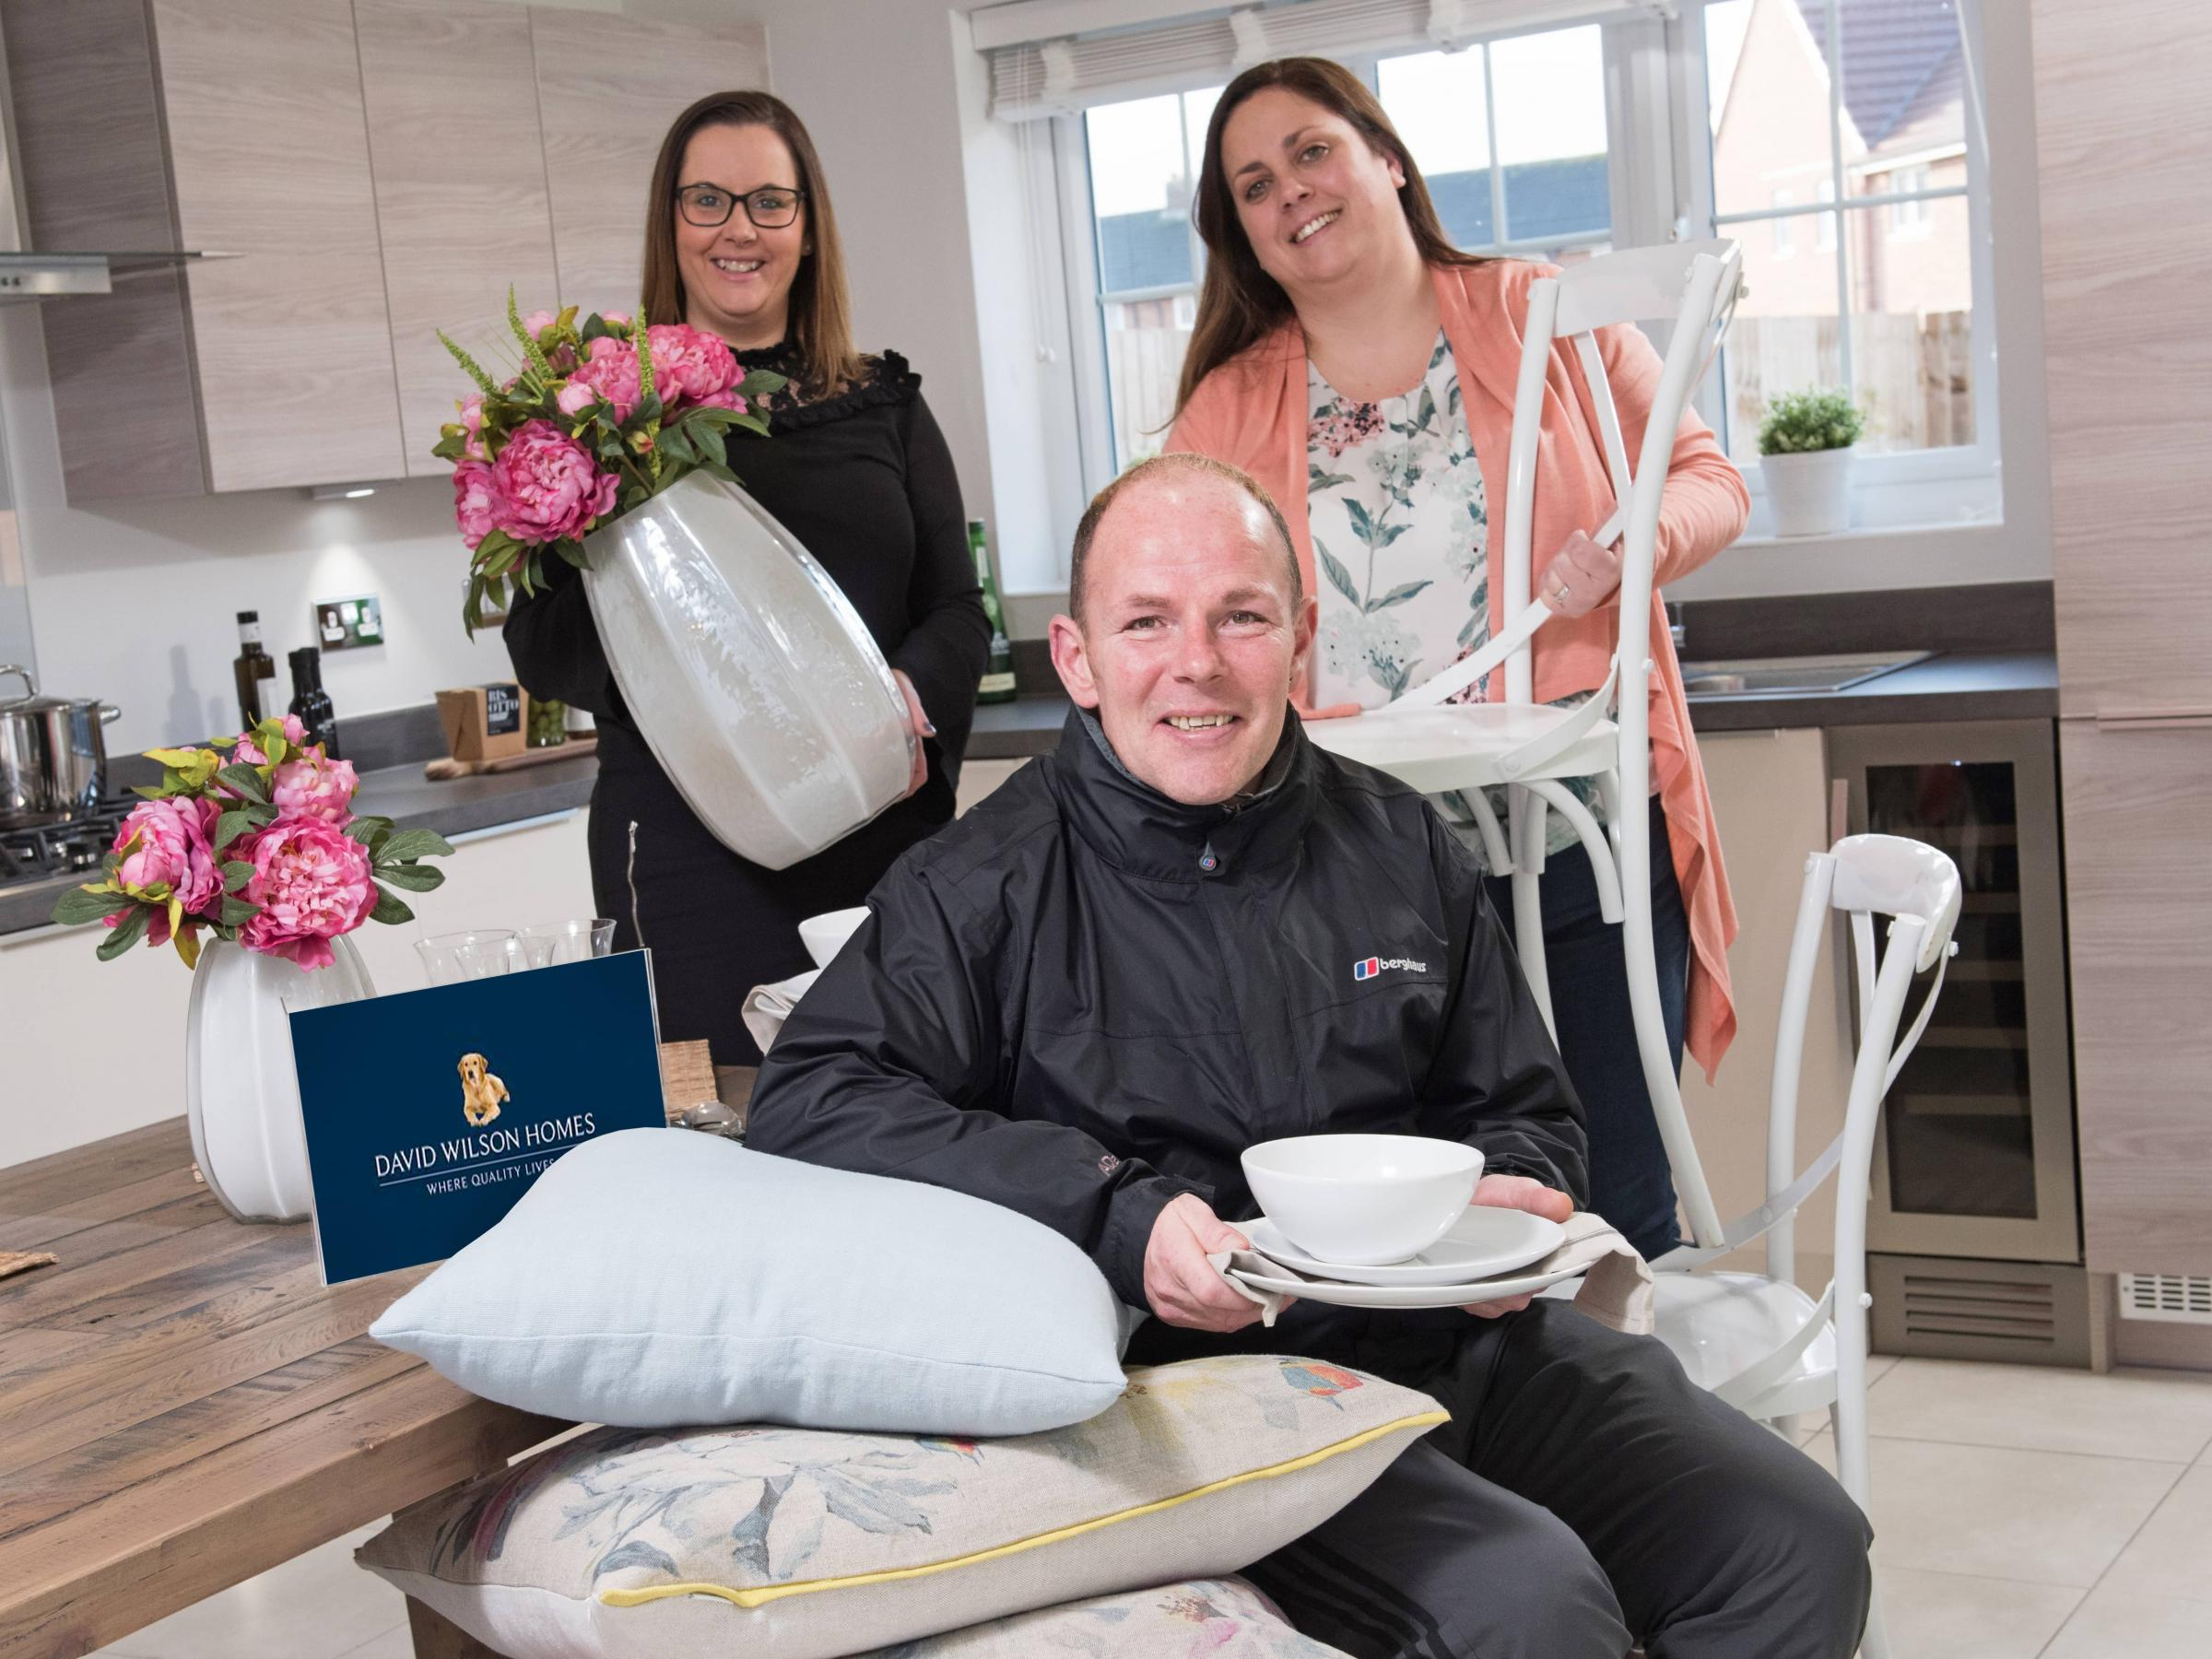 Housebuilder David Wilson Homes donates show home furniture